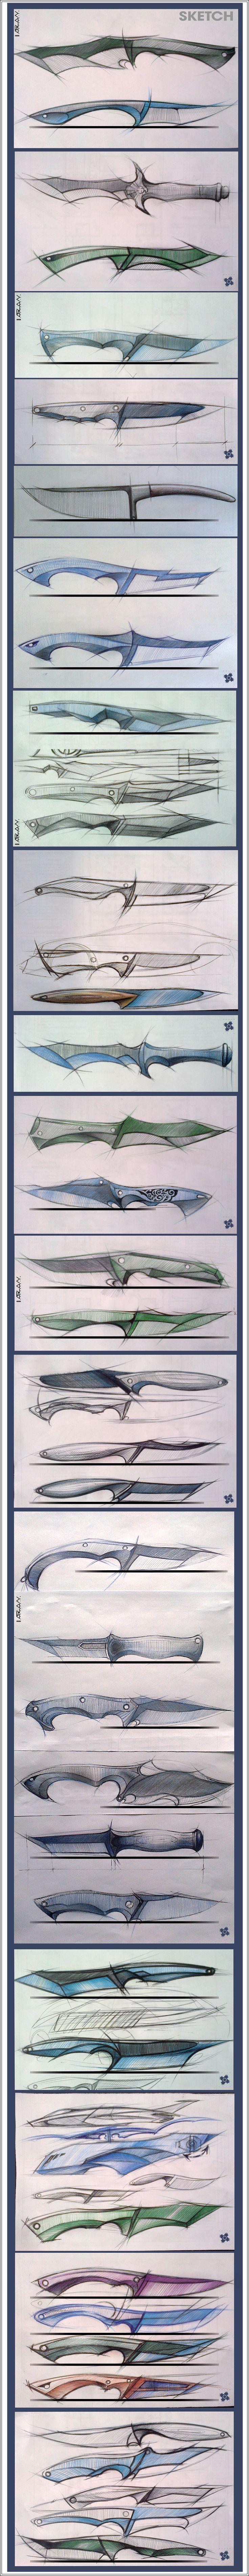 knives : )